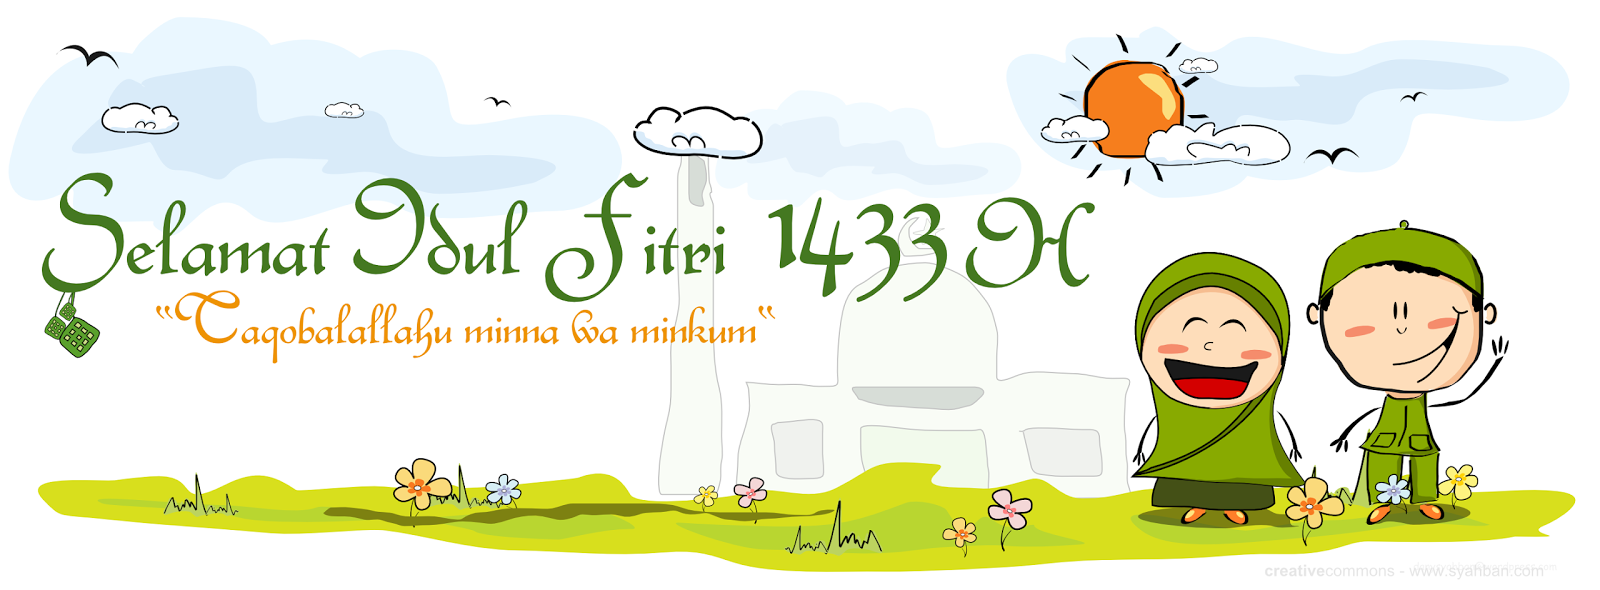 Kartu Ucapan Selamat Hari Raya Idul Fitri Info Harian